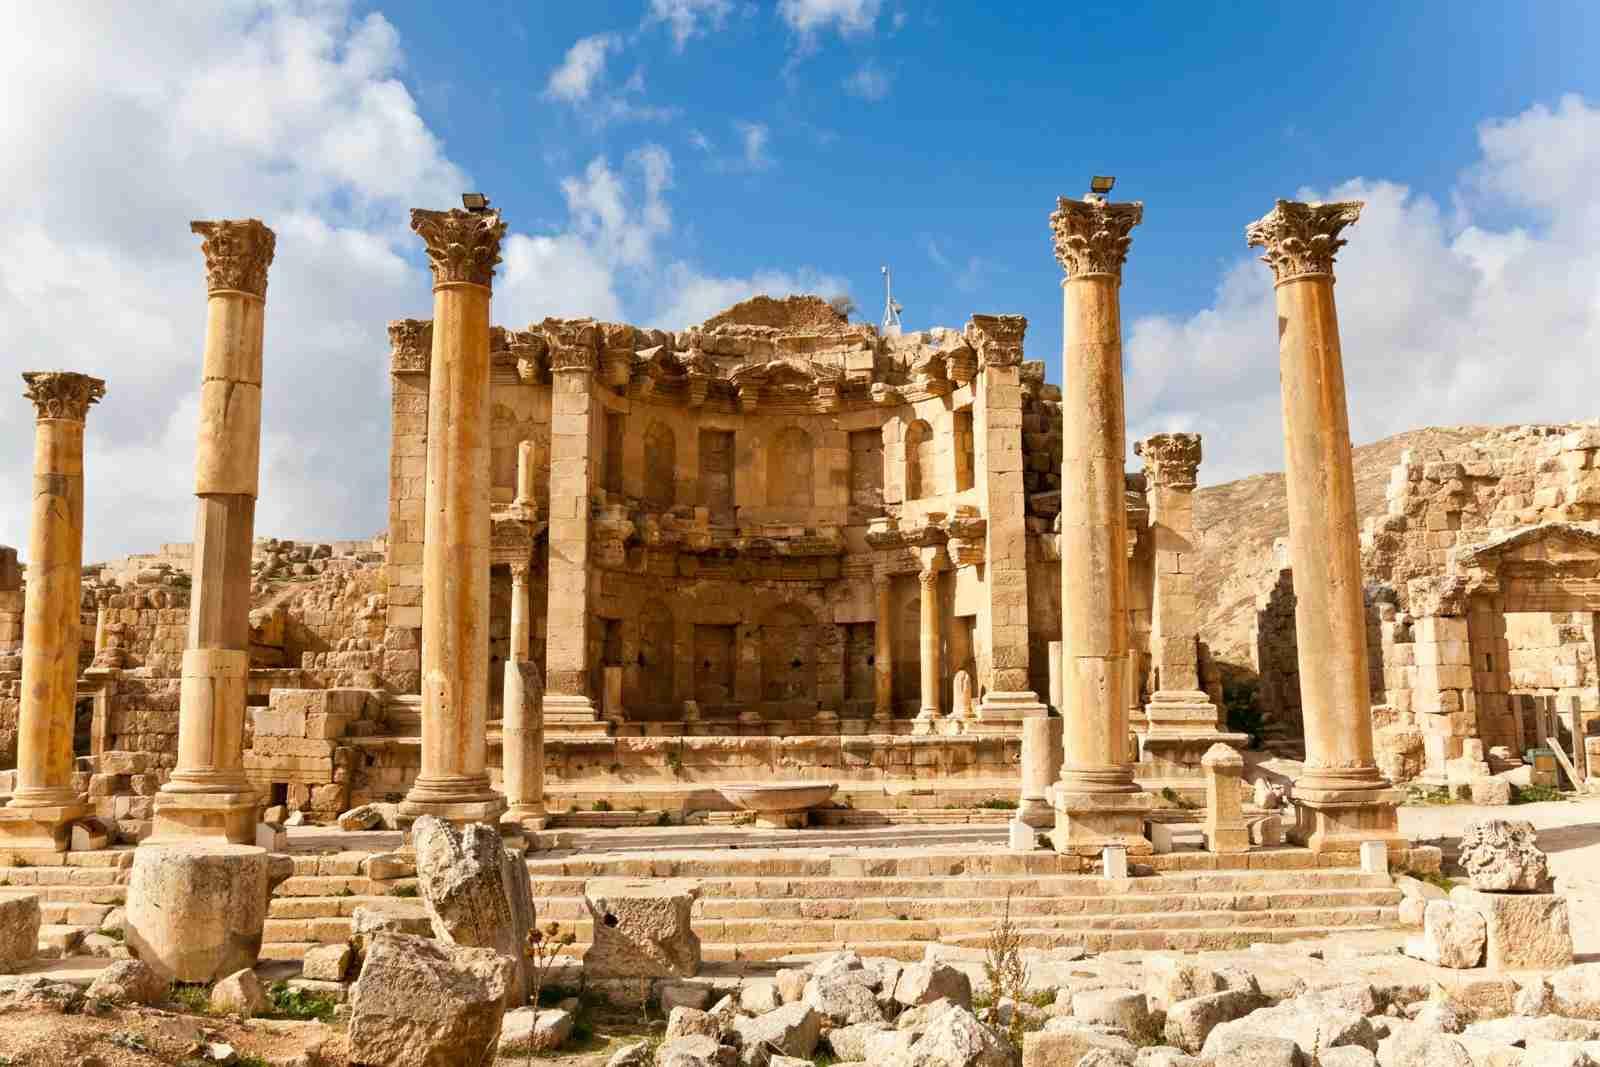 Amman, Jordan. (Photo by Veeravong Komalemena/EyeEm/Getty Images)